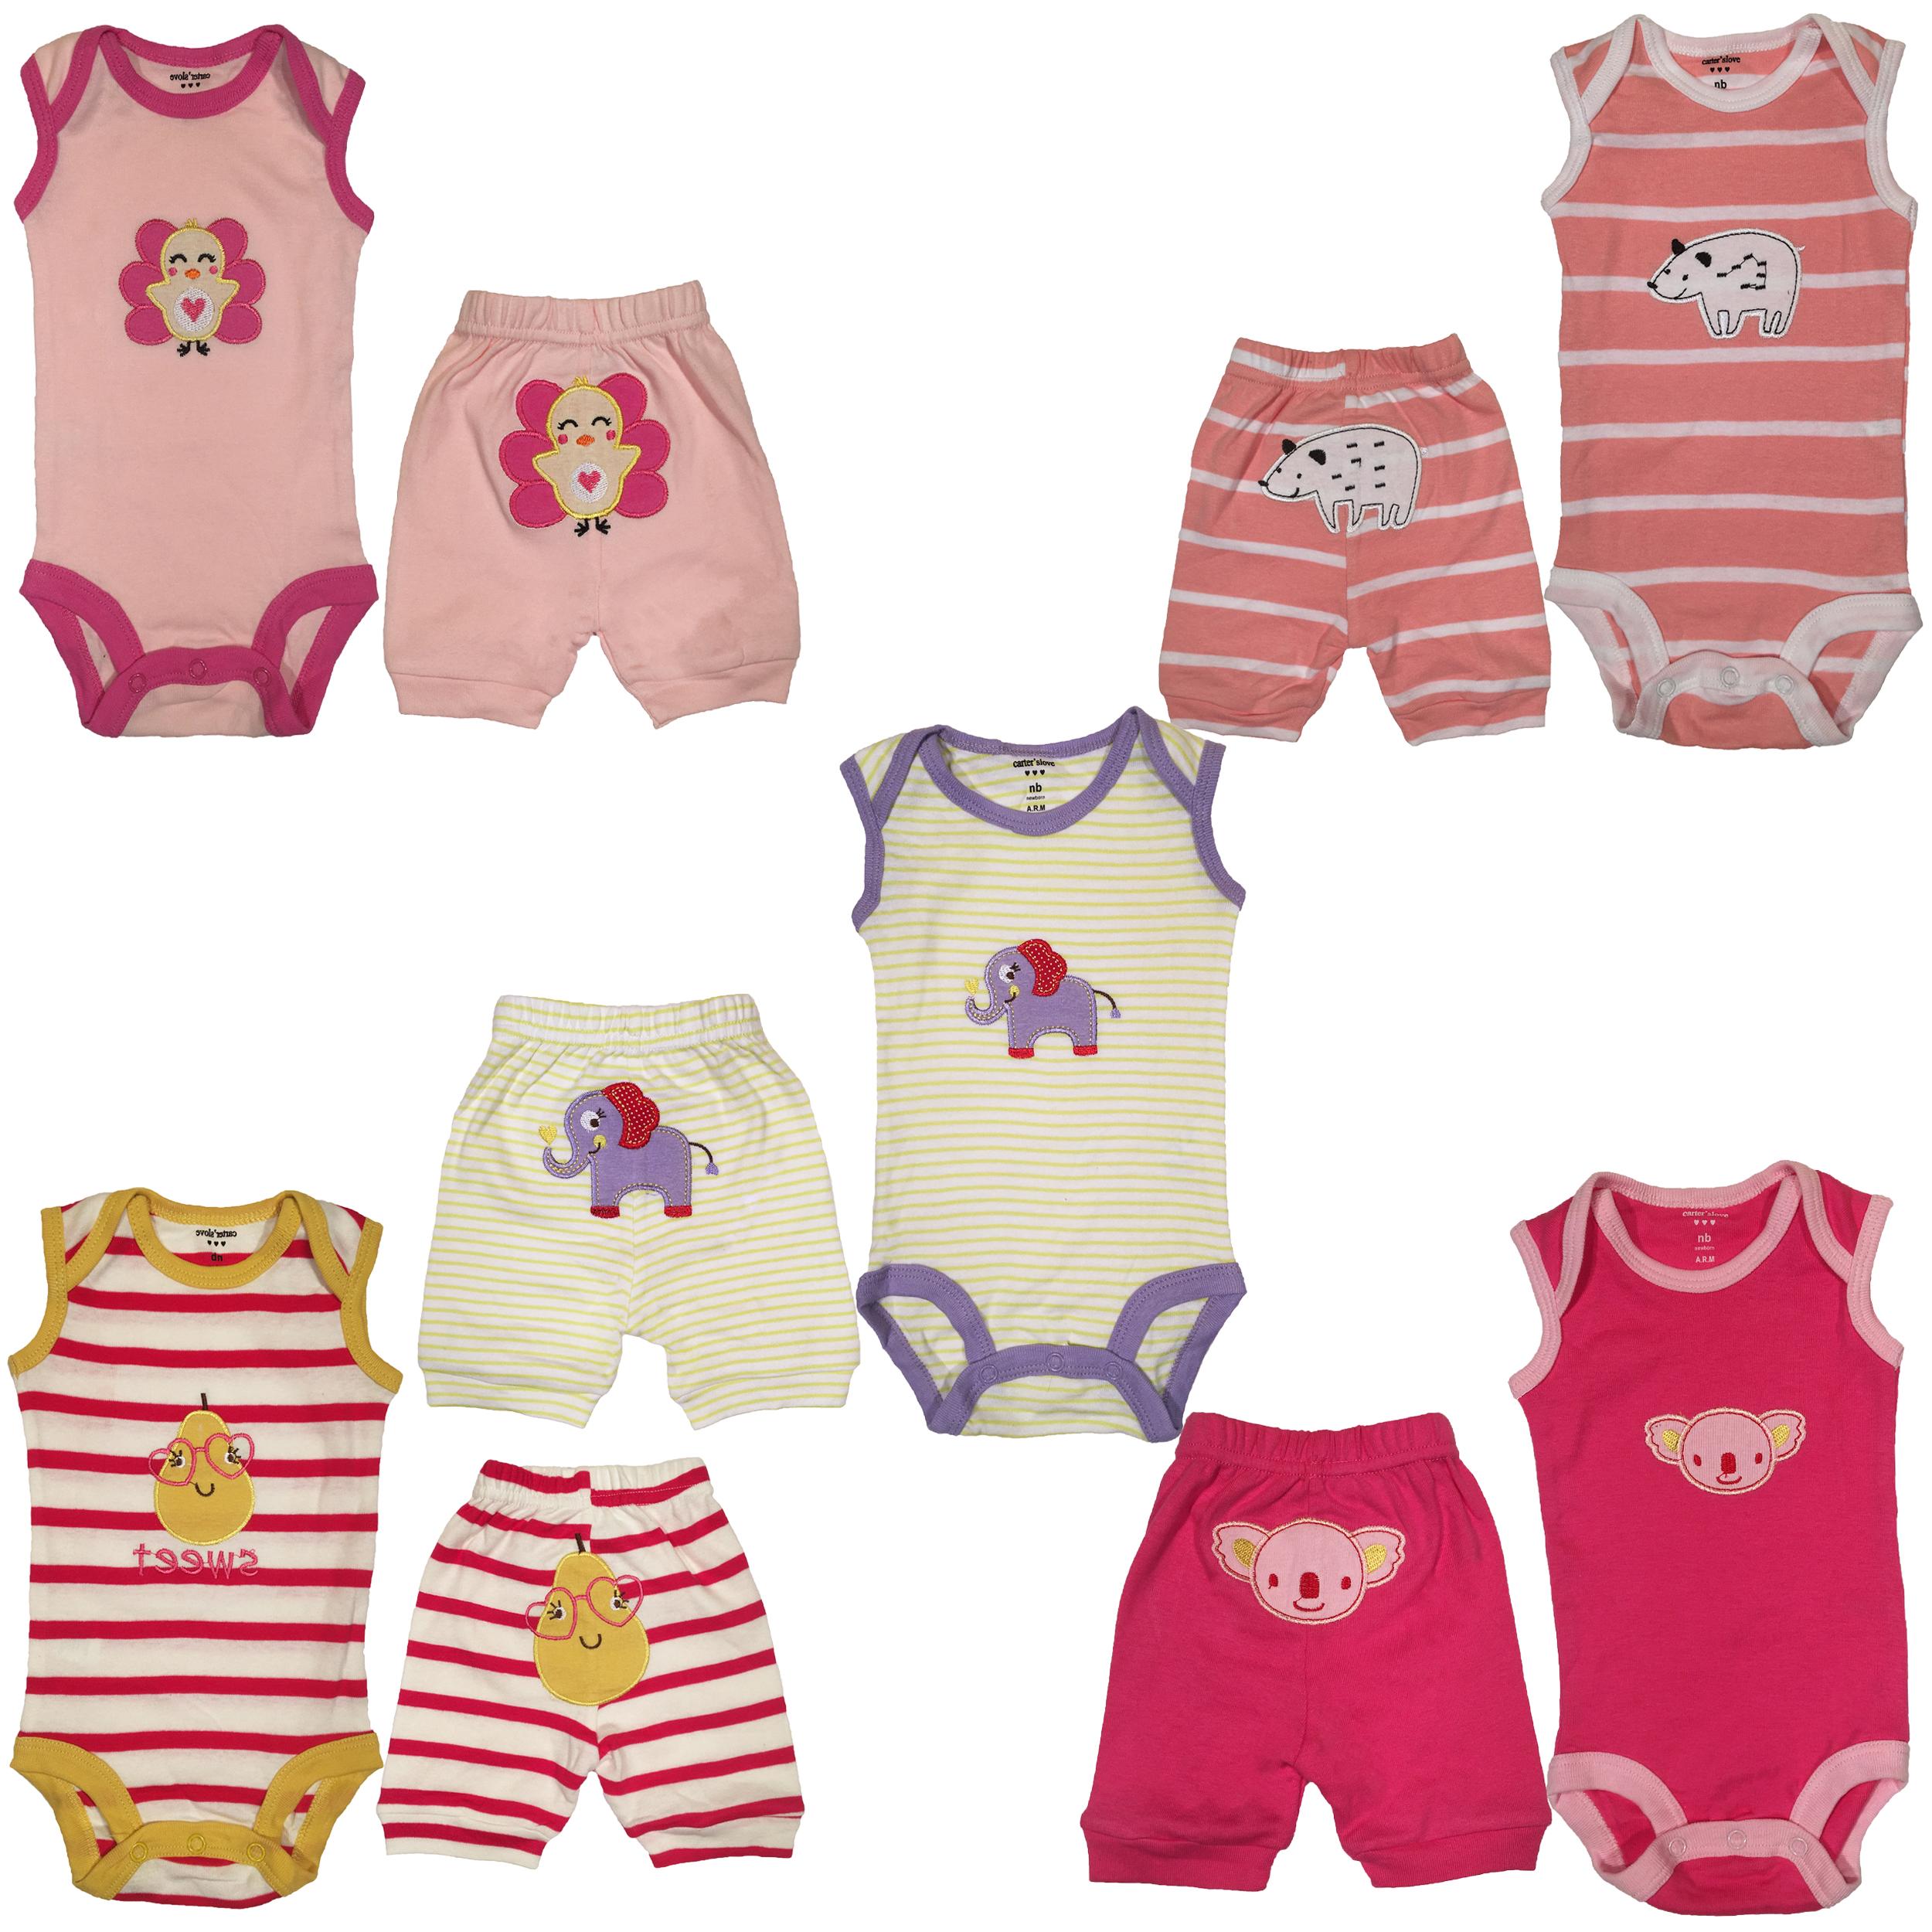 ست لباس نوزادی کارترز لاو مدل 10056-15 مجموعه 10عددی